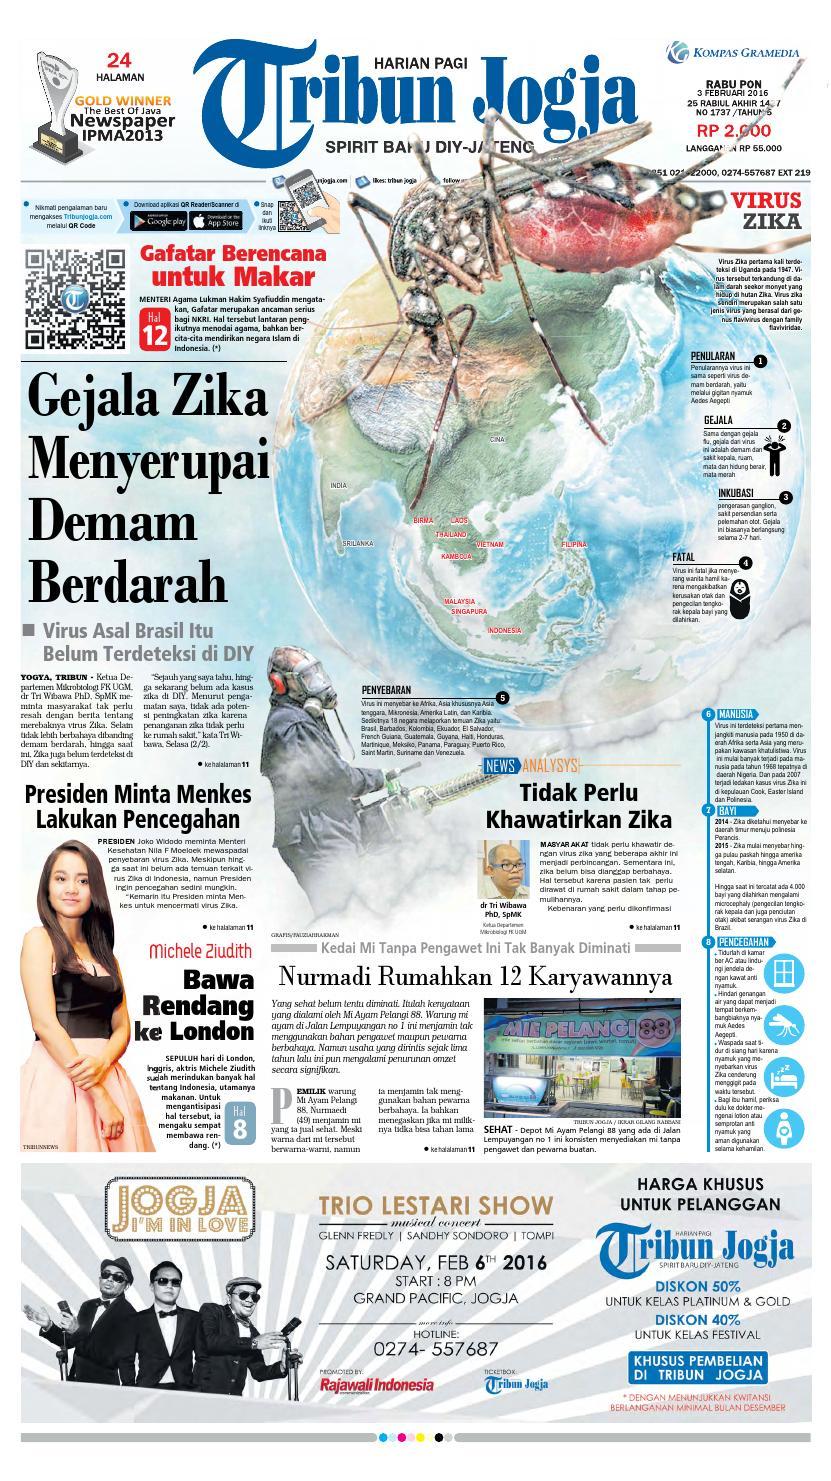 Tribunjogja 03-02-2016 by tribun jogja - issuu 301e7a7988